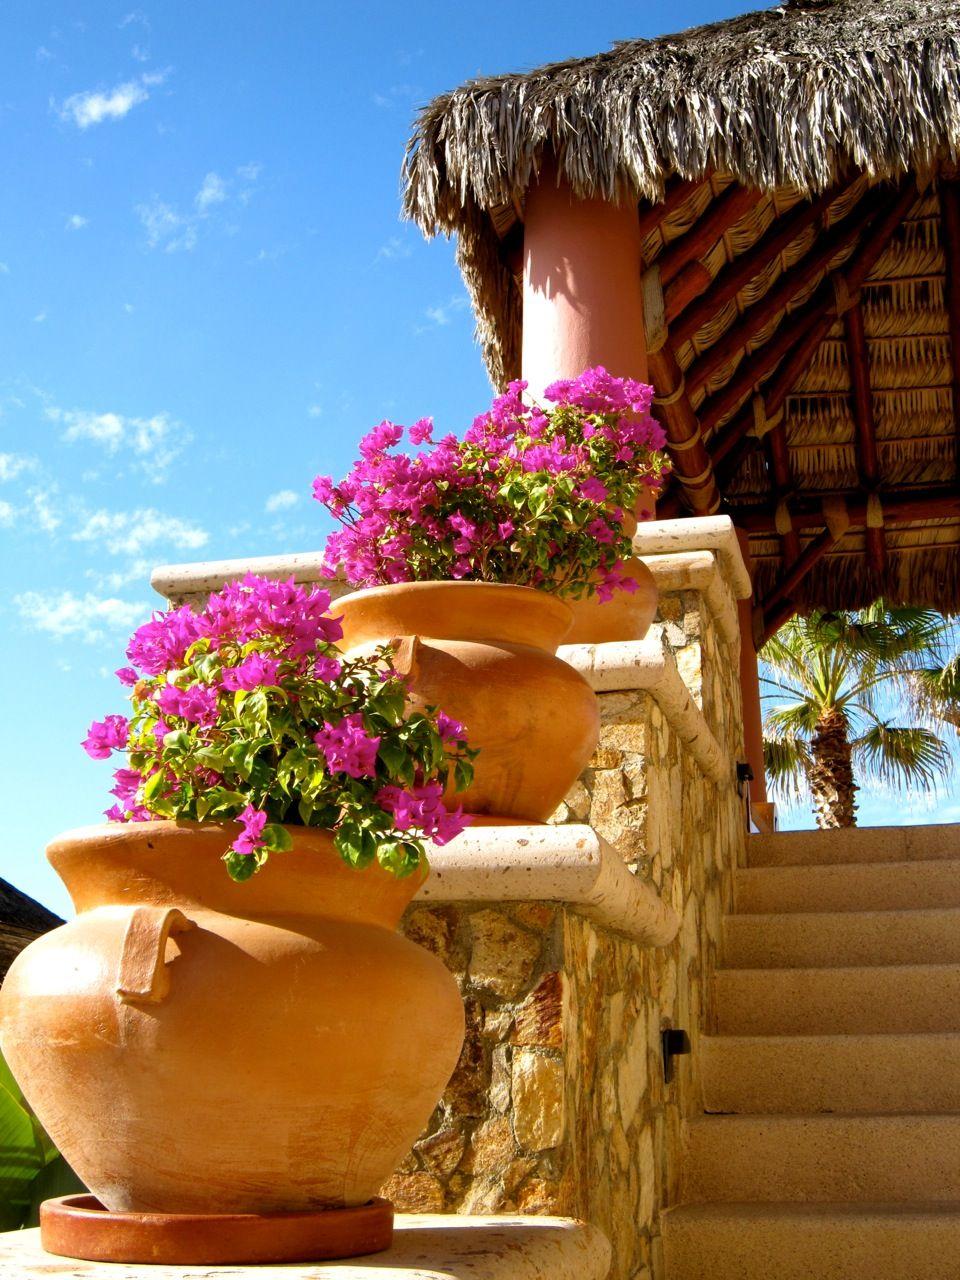 Sunshine Fresh Flowers Palapa Roof Huts Mexico